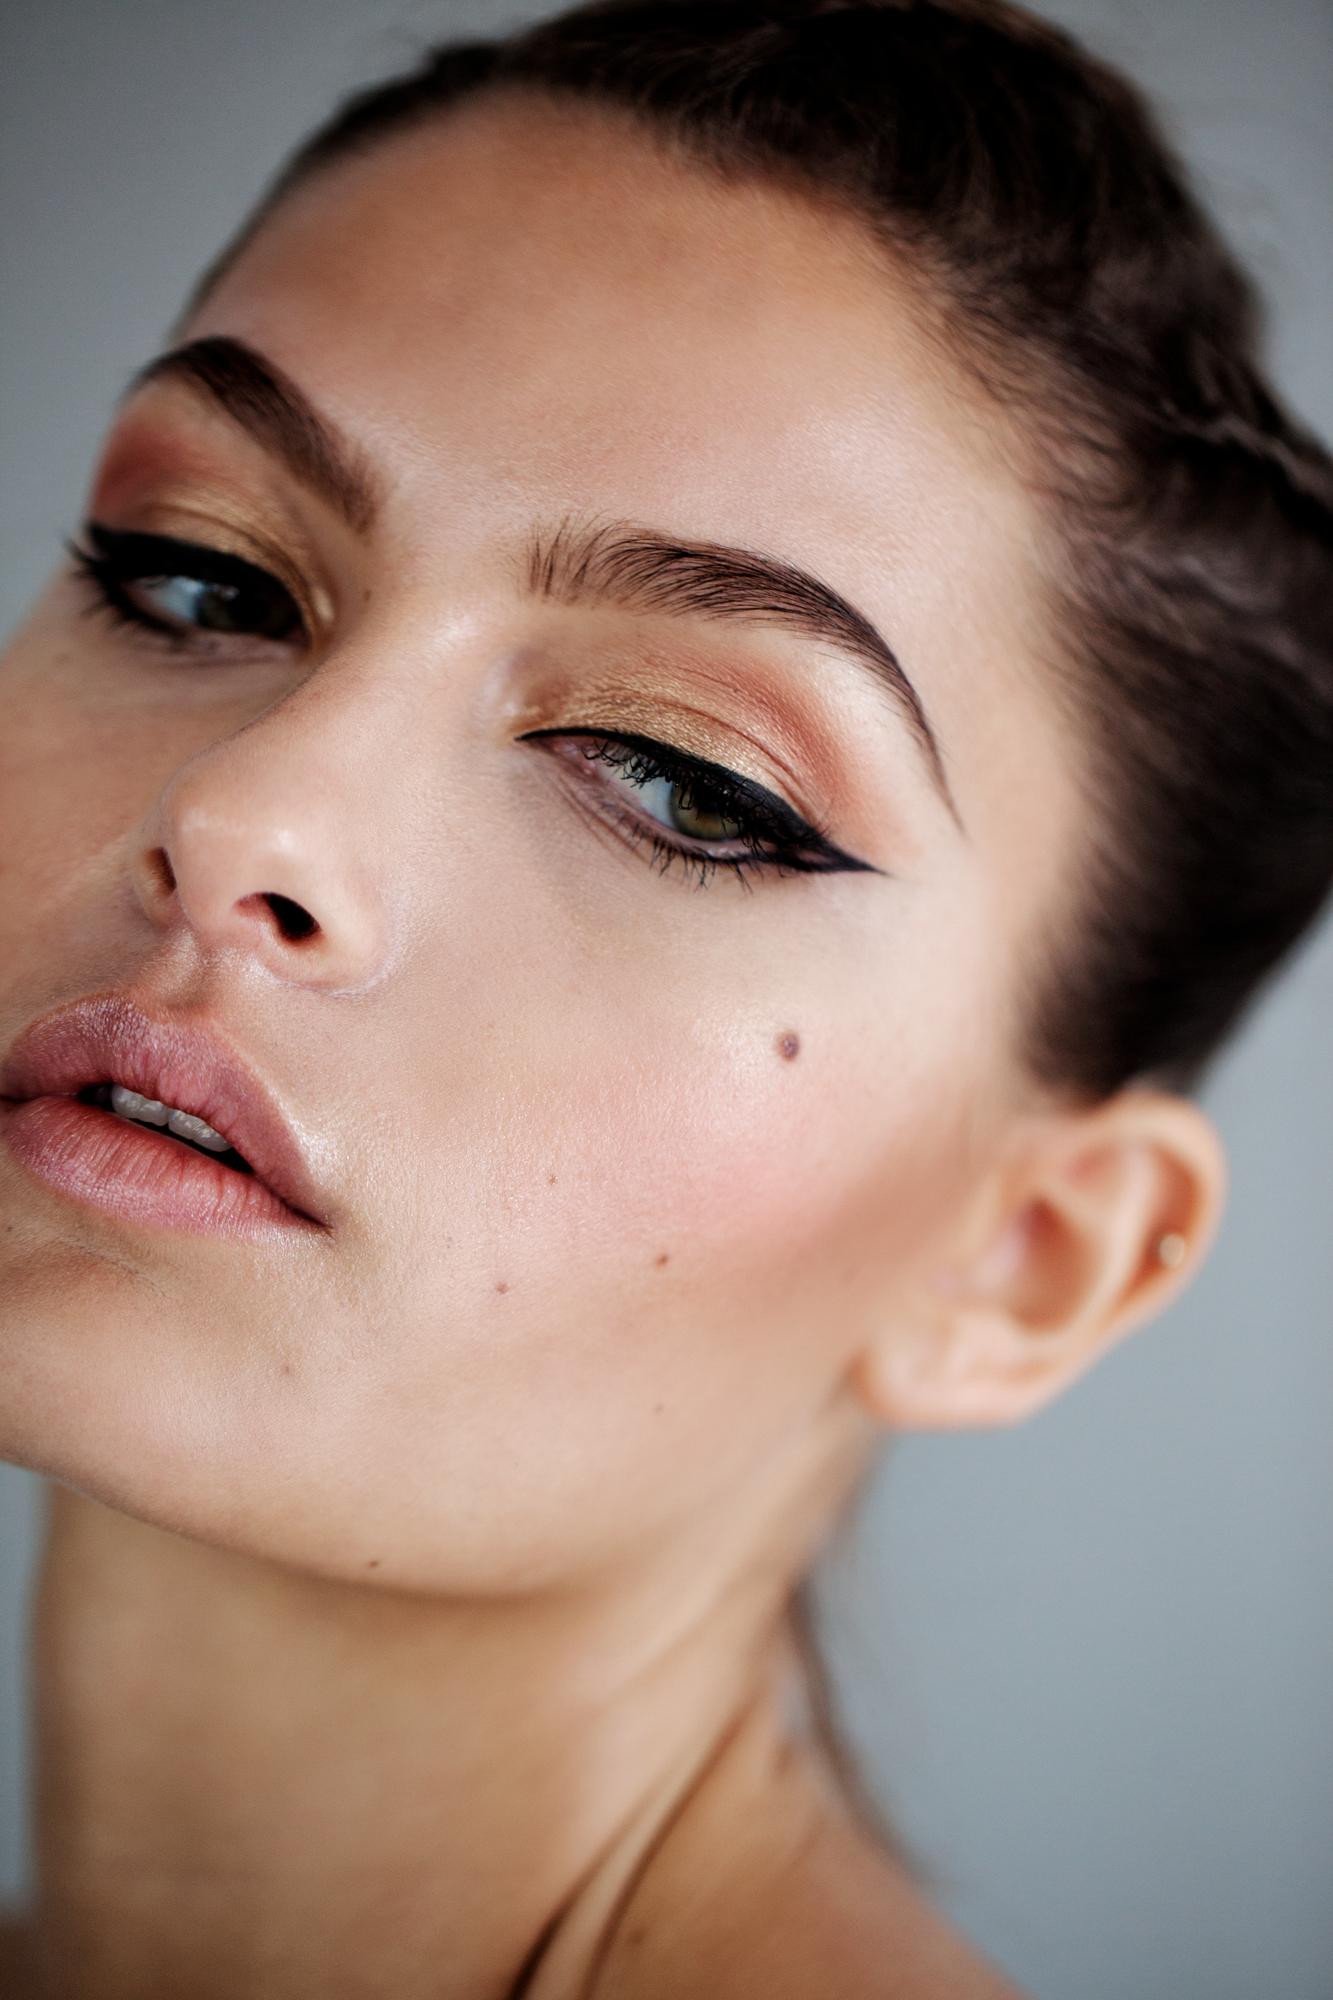 Jonathan Gordon Laura Bondl Luna Elisa Federowicz Visagistin Hair&Make-up Artist